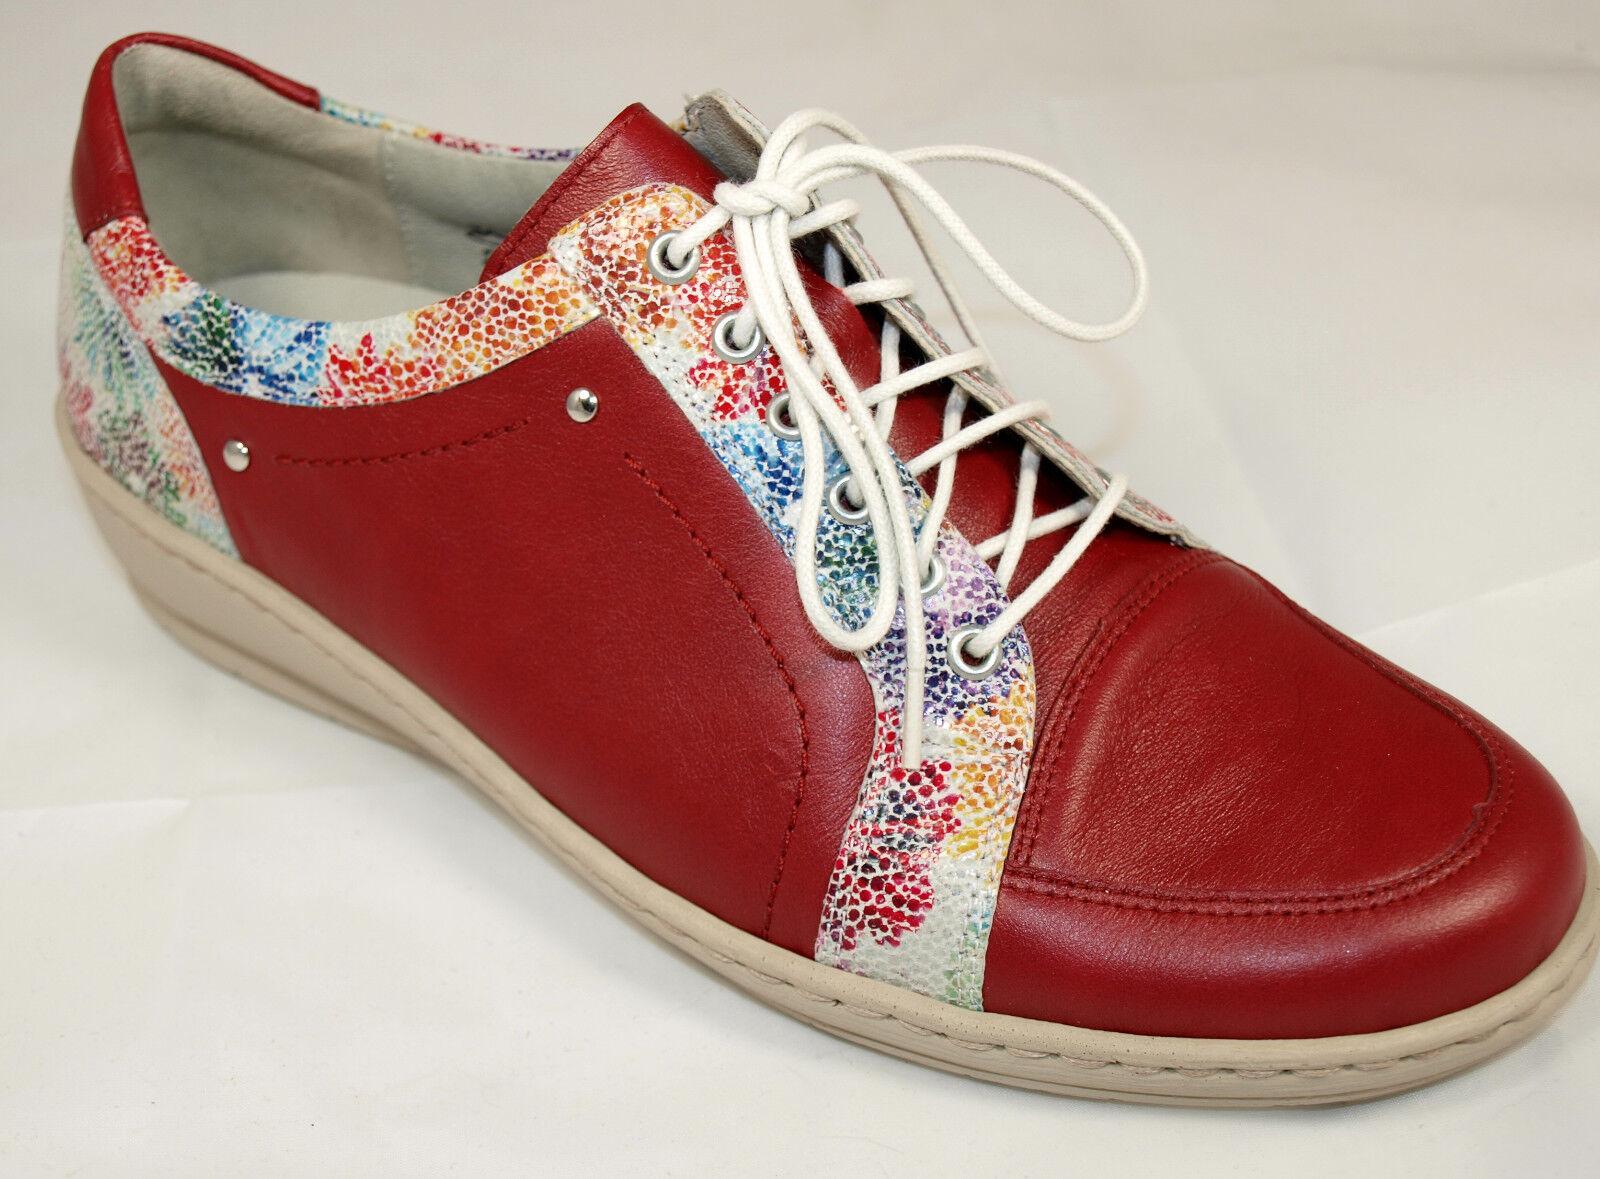 Waldläufer Schuhe Damen Leder Weite K rot Schnürschuhe Neu 878 4   eBay 8d54dbecbc